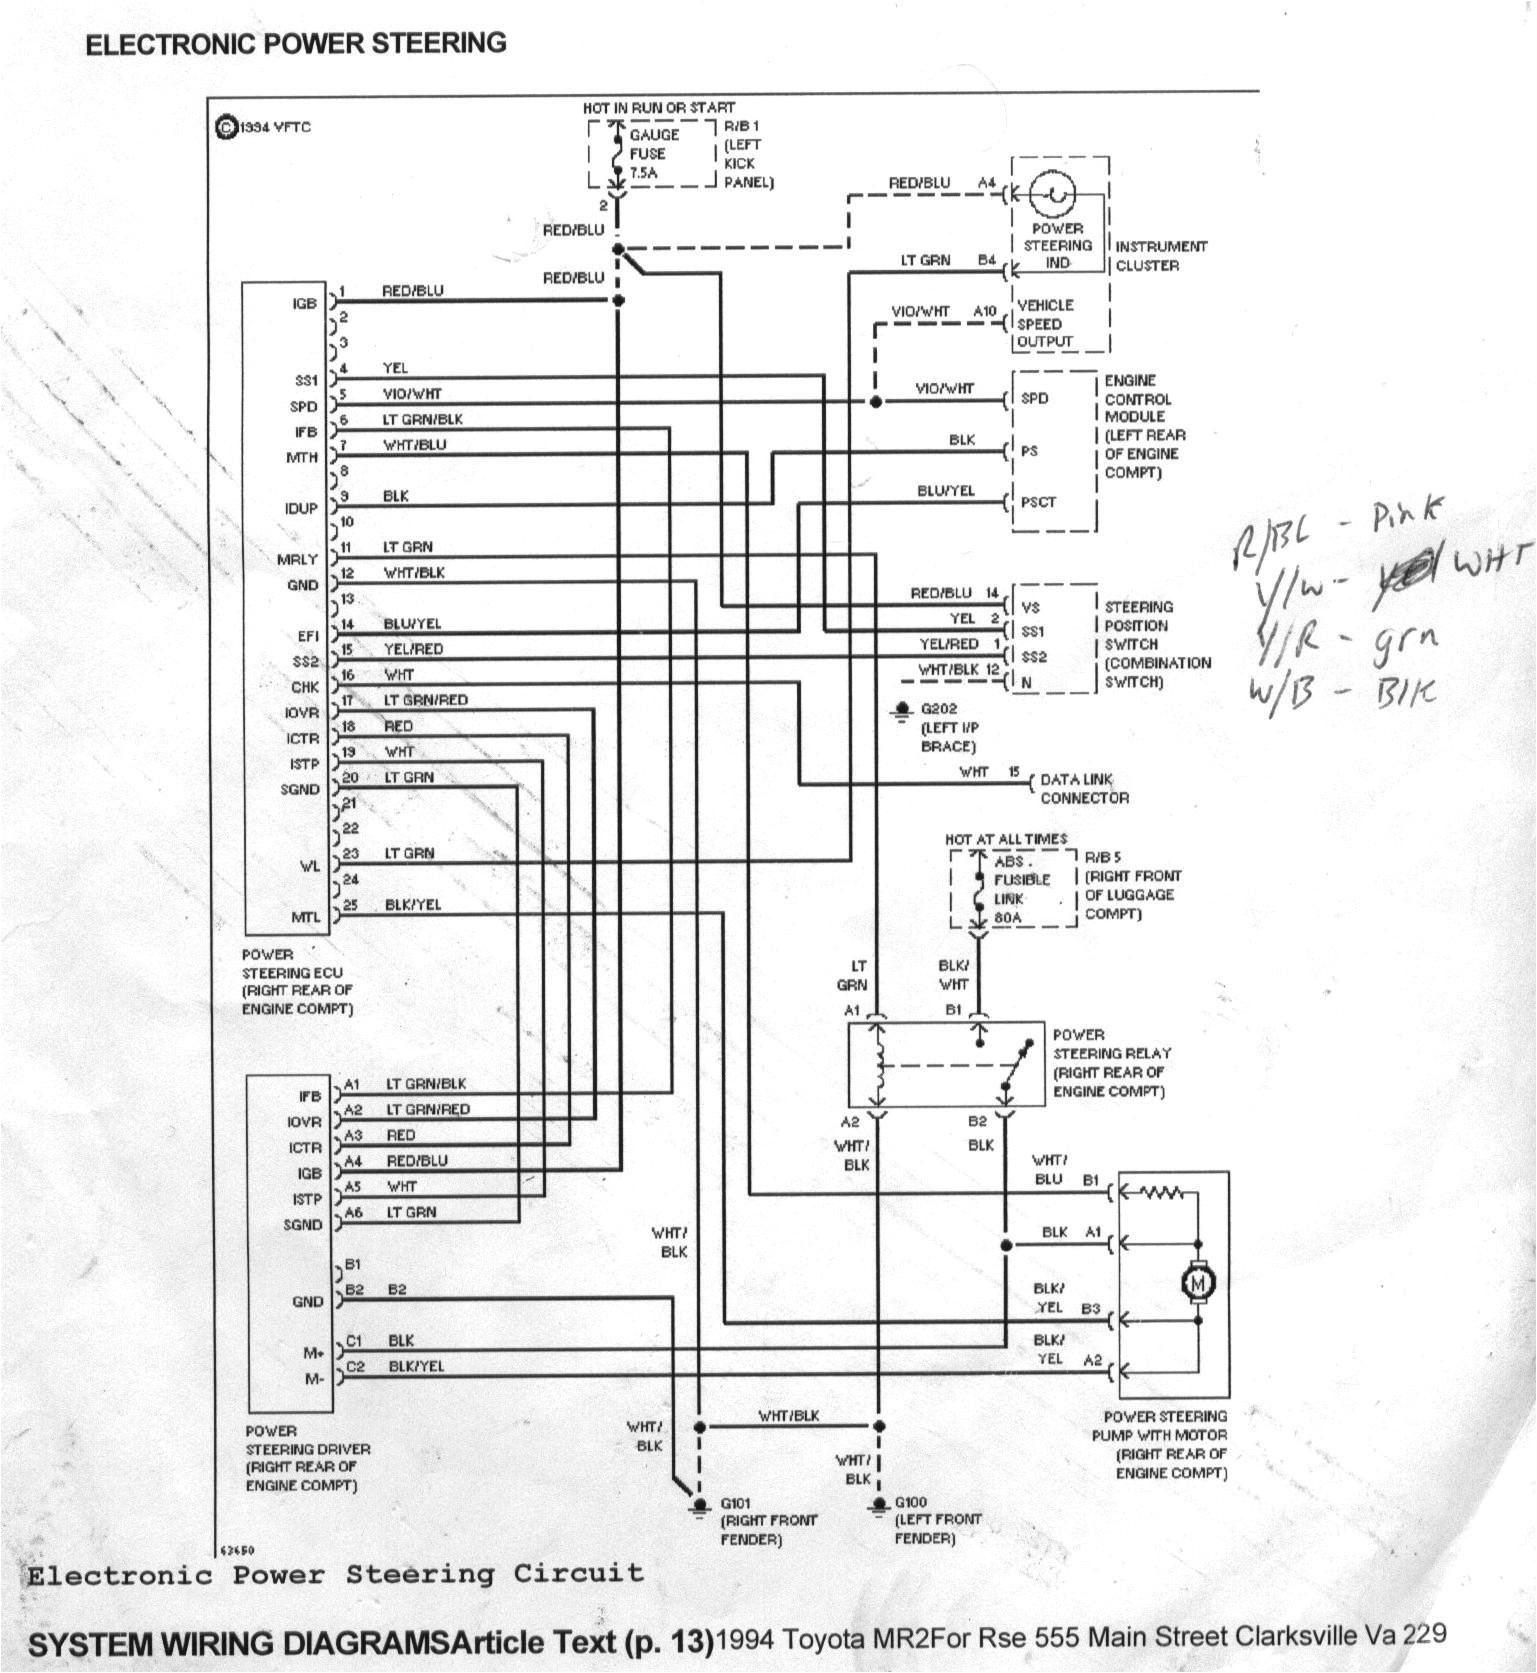 2005 Honda Element Stereo Wiring Diagram Honda Element Stereo Wiring Wiring Diagram